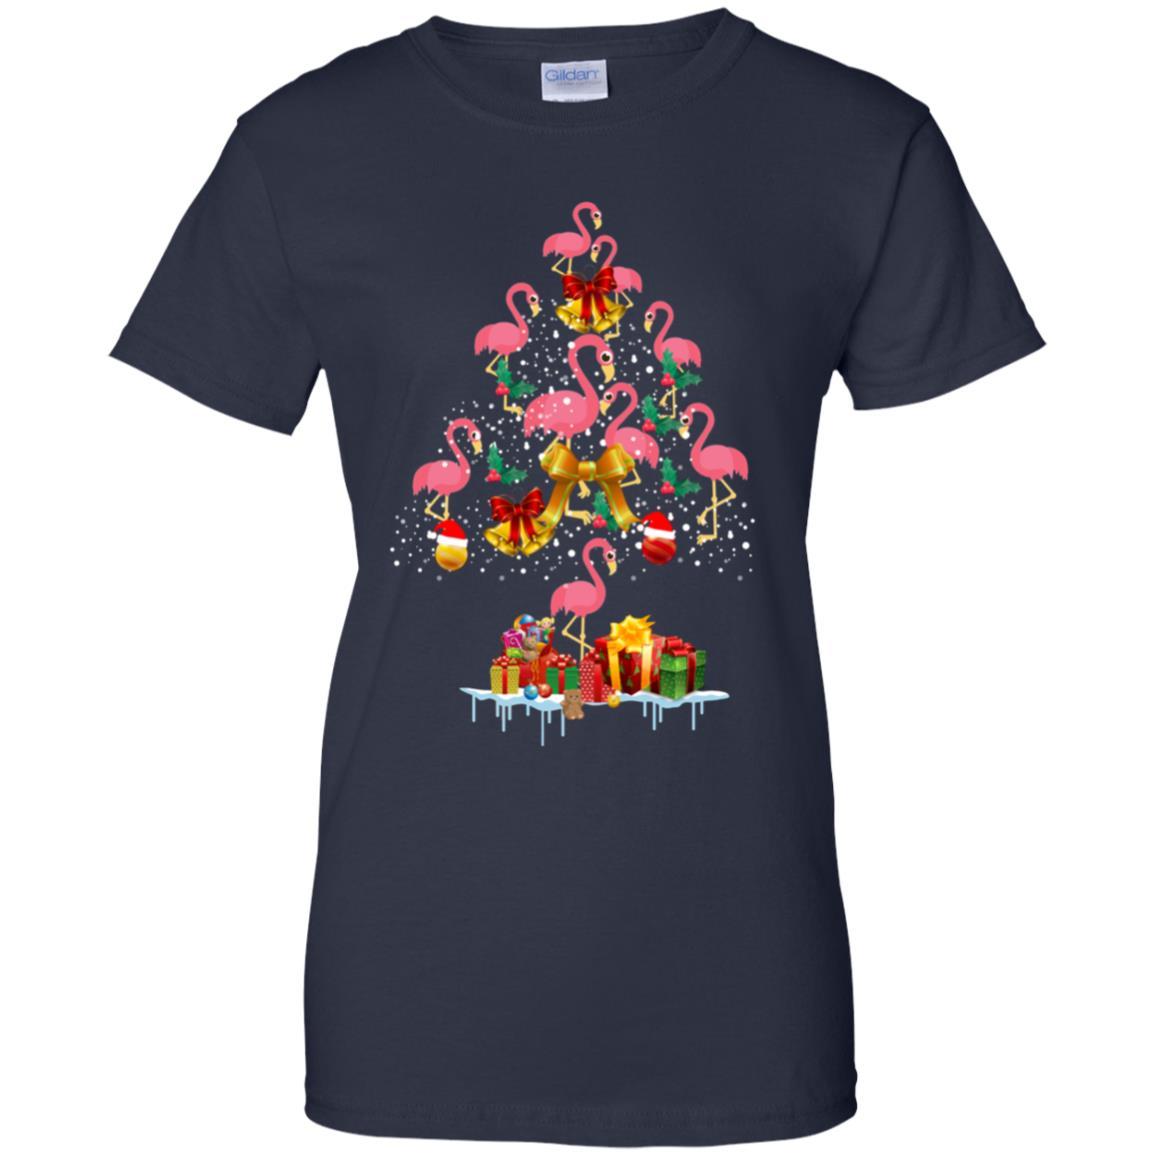 Flamingo Christmas Tree Sweater - NextlevelA